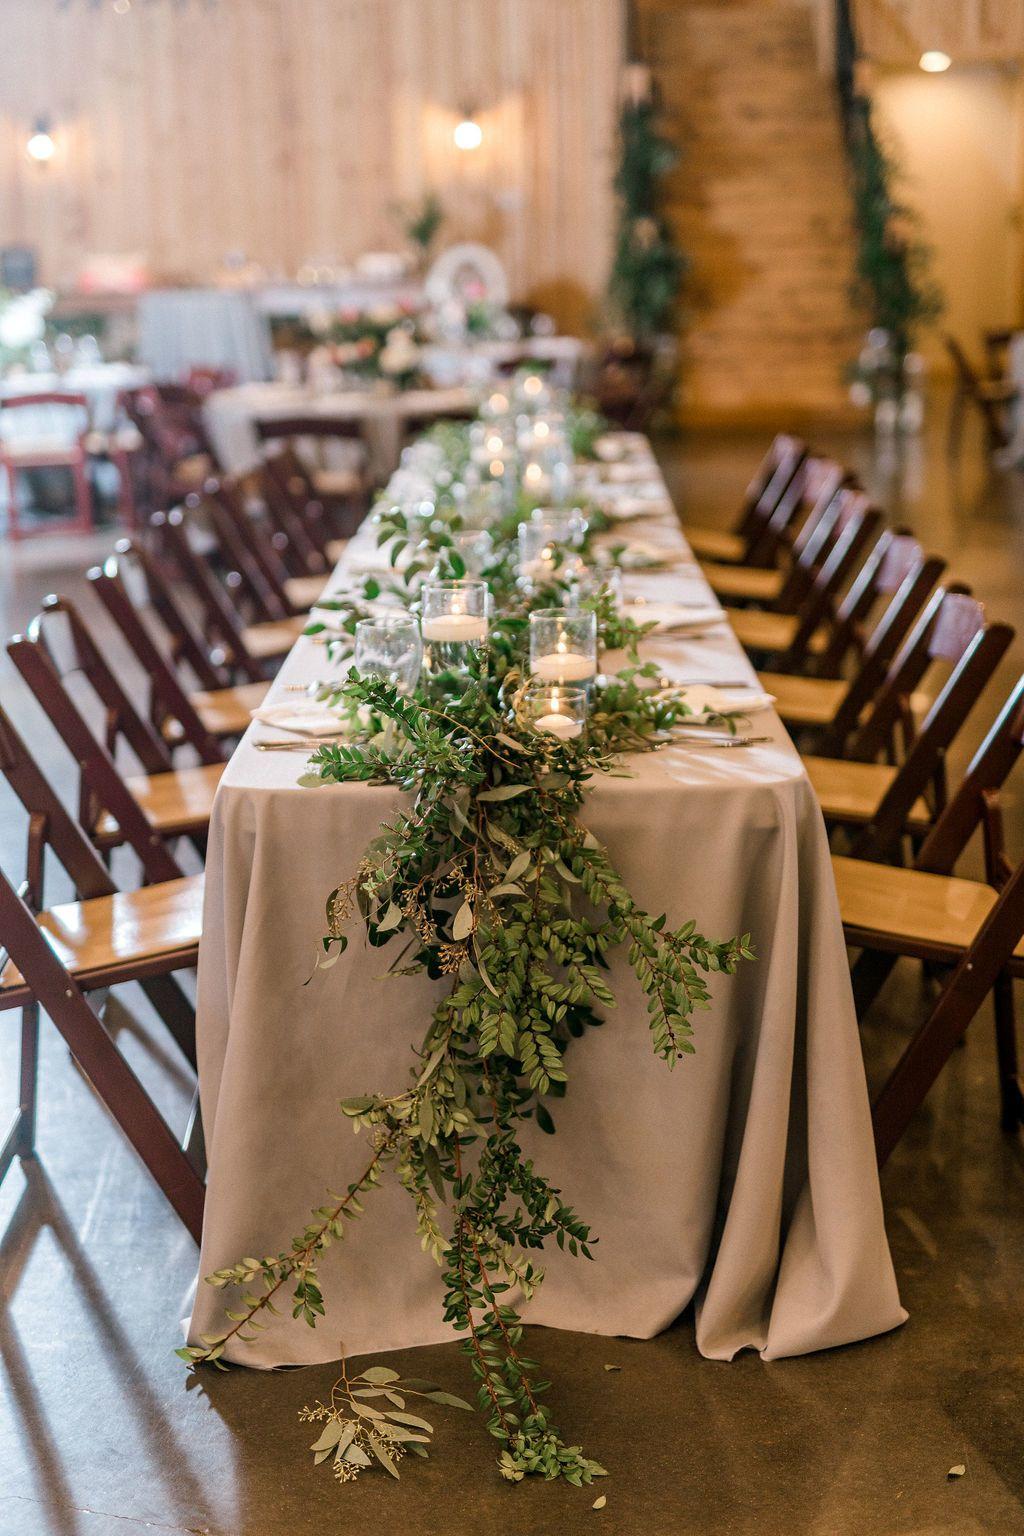 Long Bohemian Wedding Centerpiece Greenery Wedding Centerpiece Wedding Reception Centerpieces Bohemian Wedding Centerpieces Bohemian Wedding Decorations